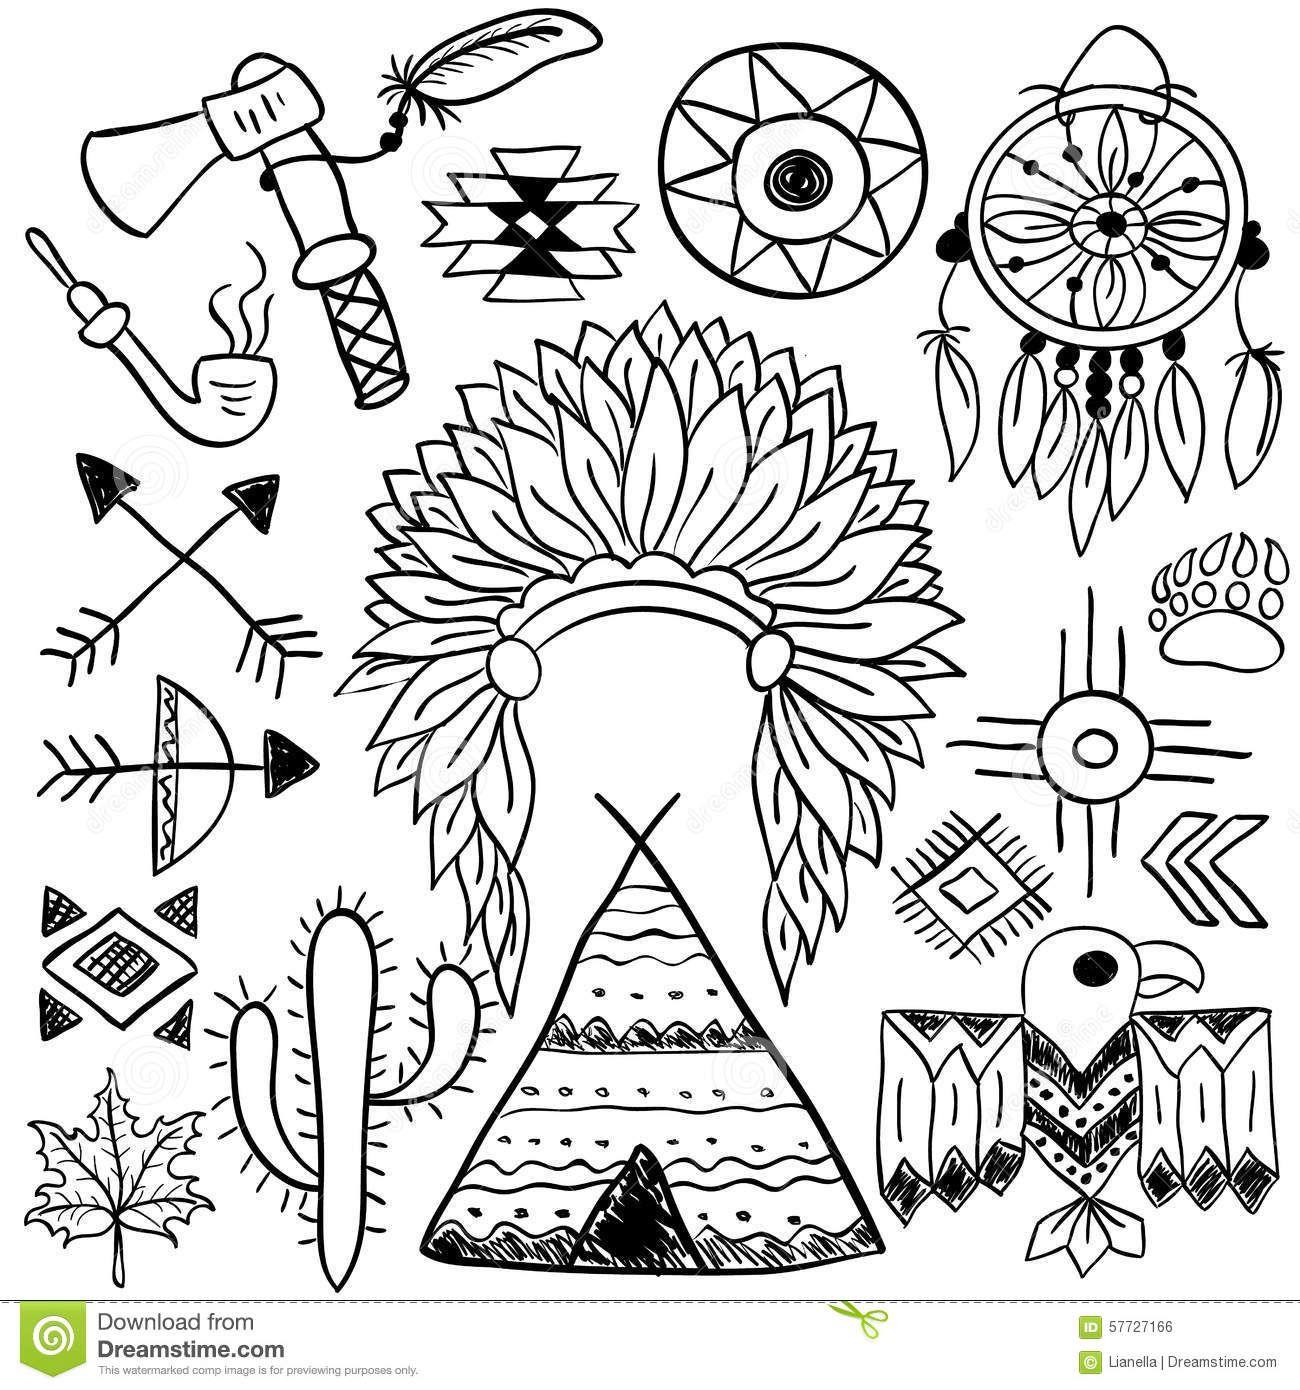 Hand drawn doodle vector native american symbols set en 7